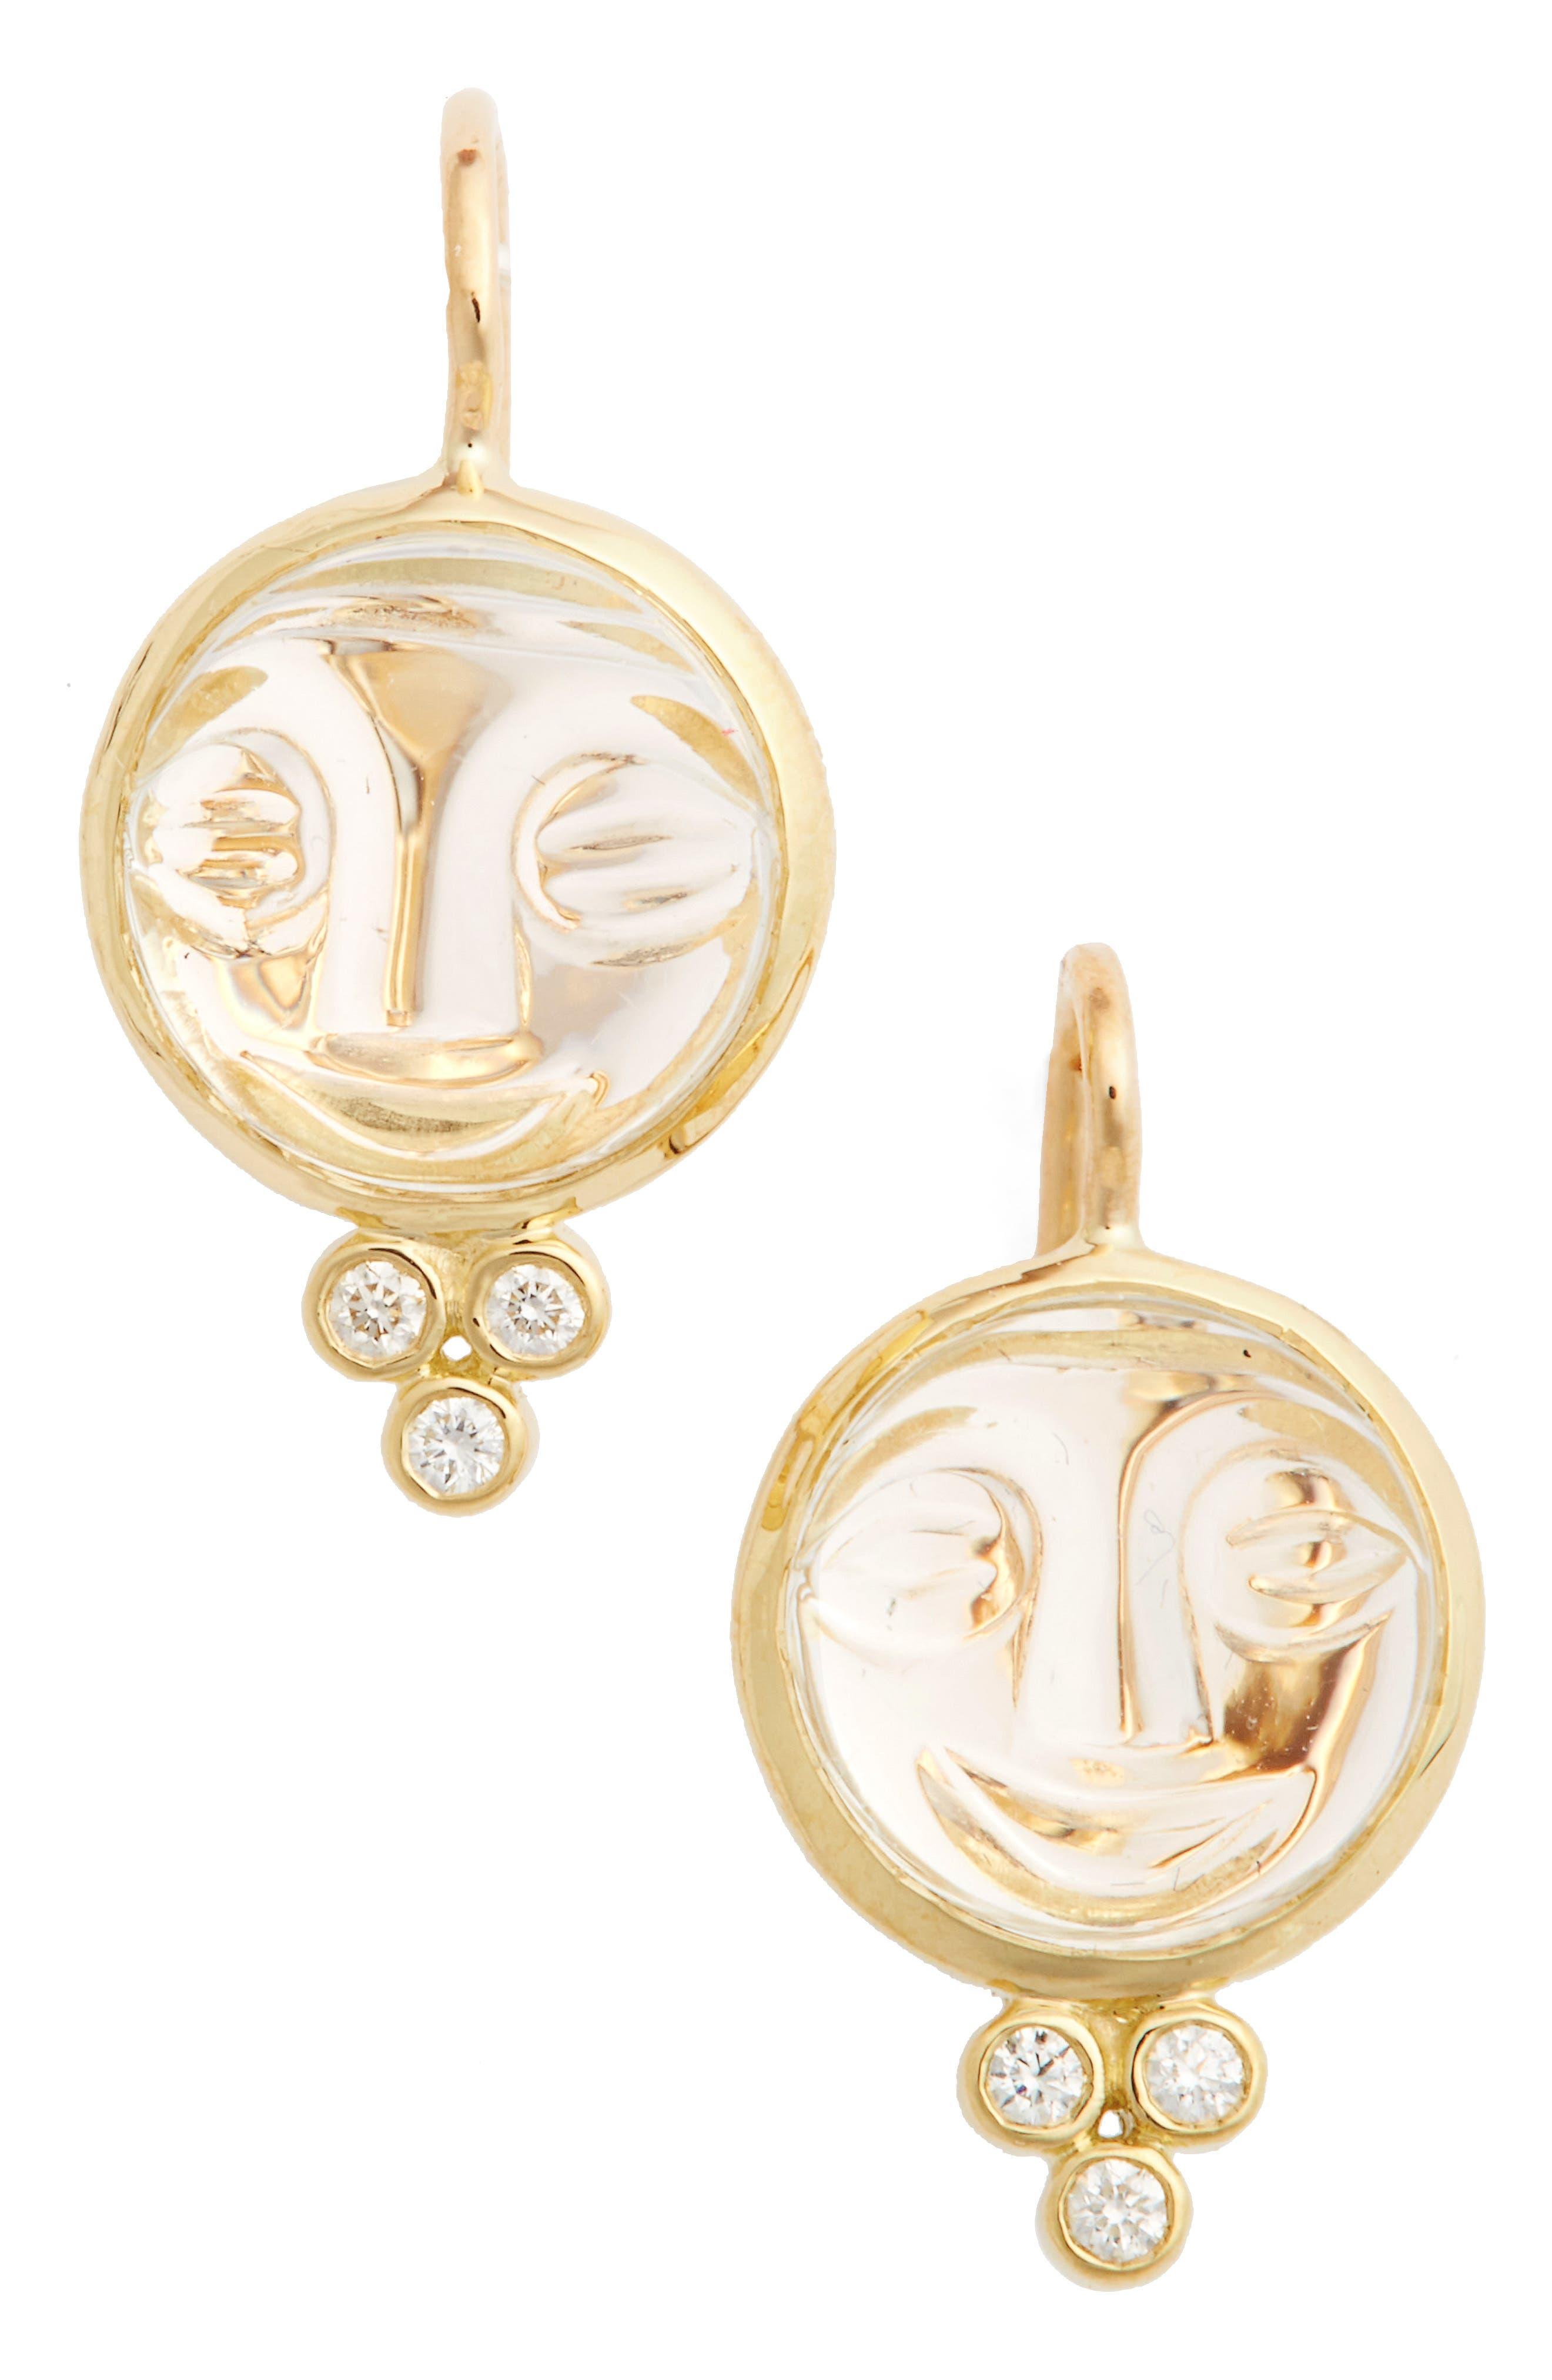 Temple St. Clair Moonface Diamond & Rock Crystal Earrings,                             Main thumbnail 1, color,                             YELLOW GOLD/ CRYSTAL